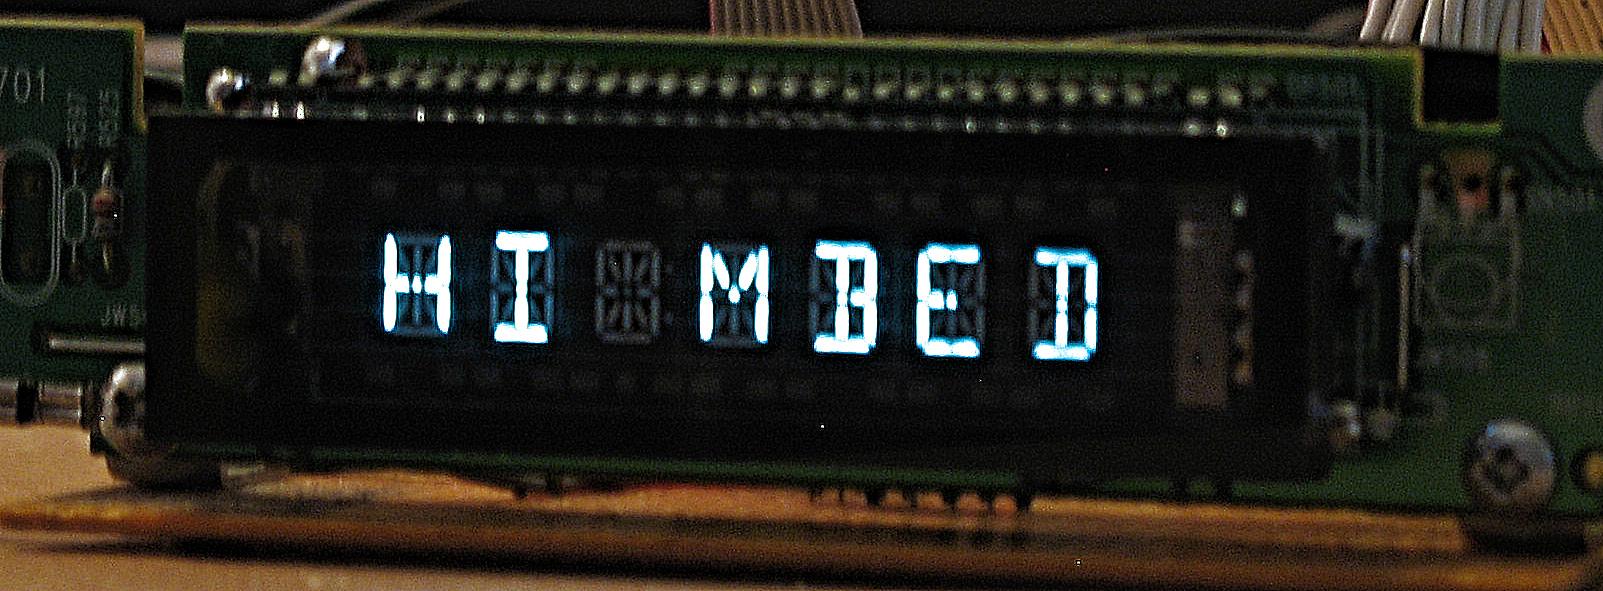 Vacuum Fluorescent Display Vfd Drivers Mbed Matrix Driver Schematic Verification Led Forum Media Uploads Wim Img 3799 B